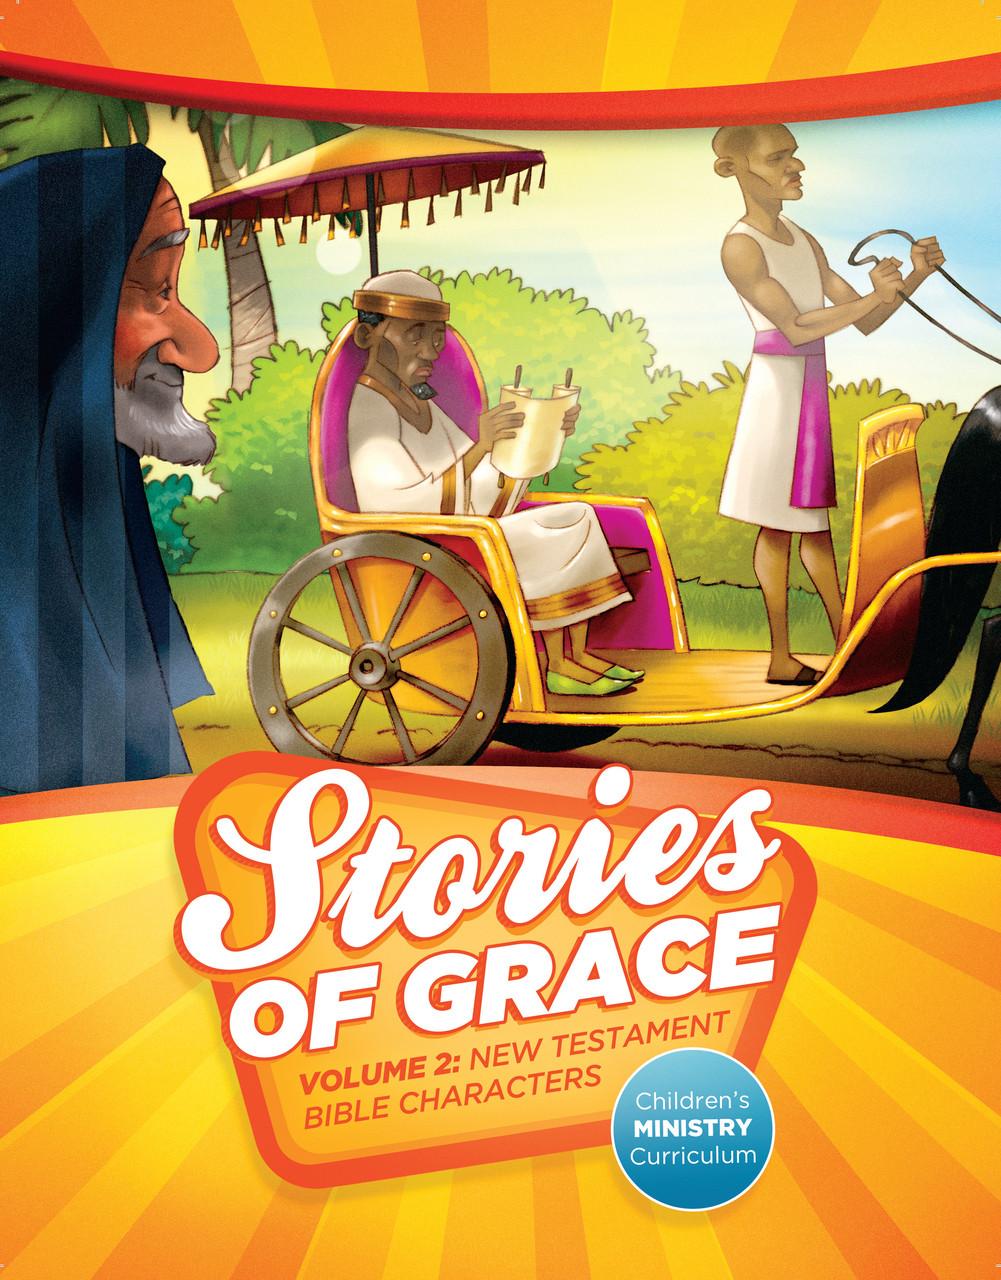 Bible Character Volume 1